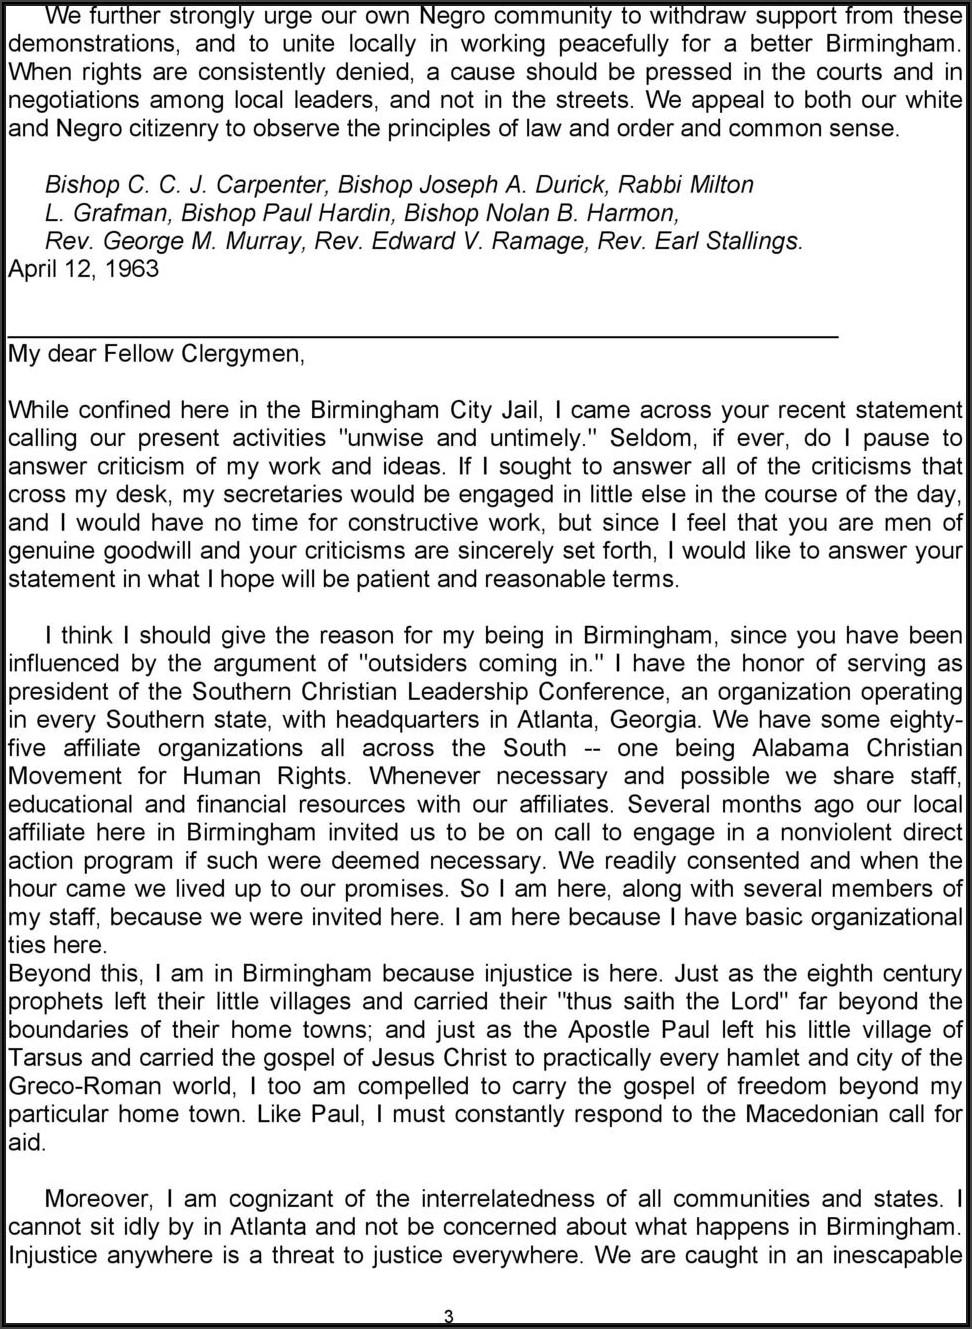 Martin Luther King Jr Letter From Birmingham Jail Pdf